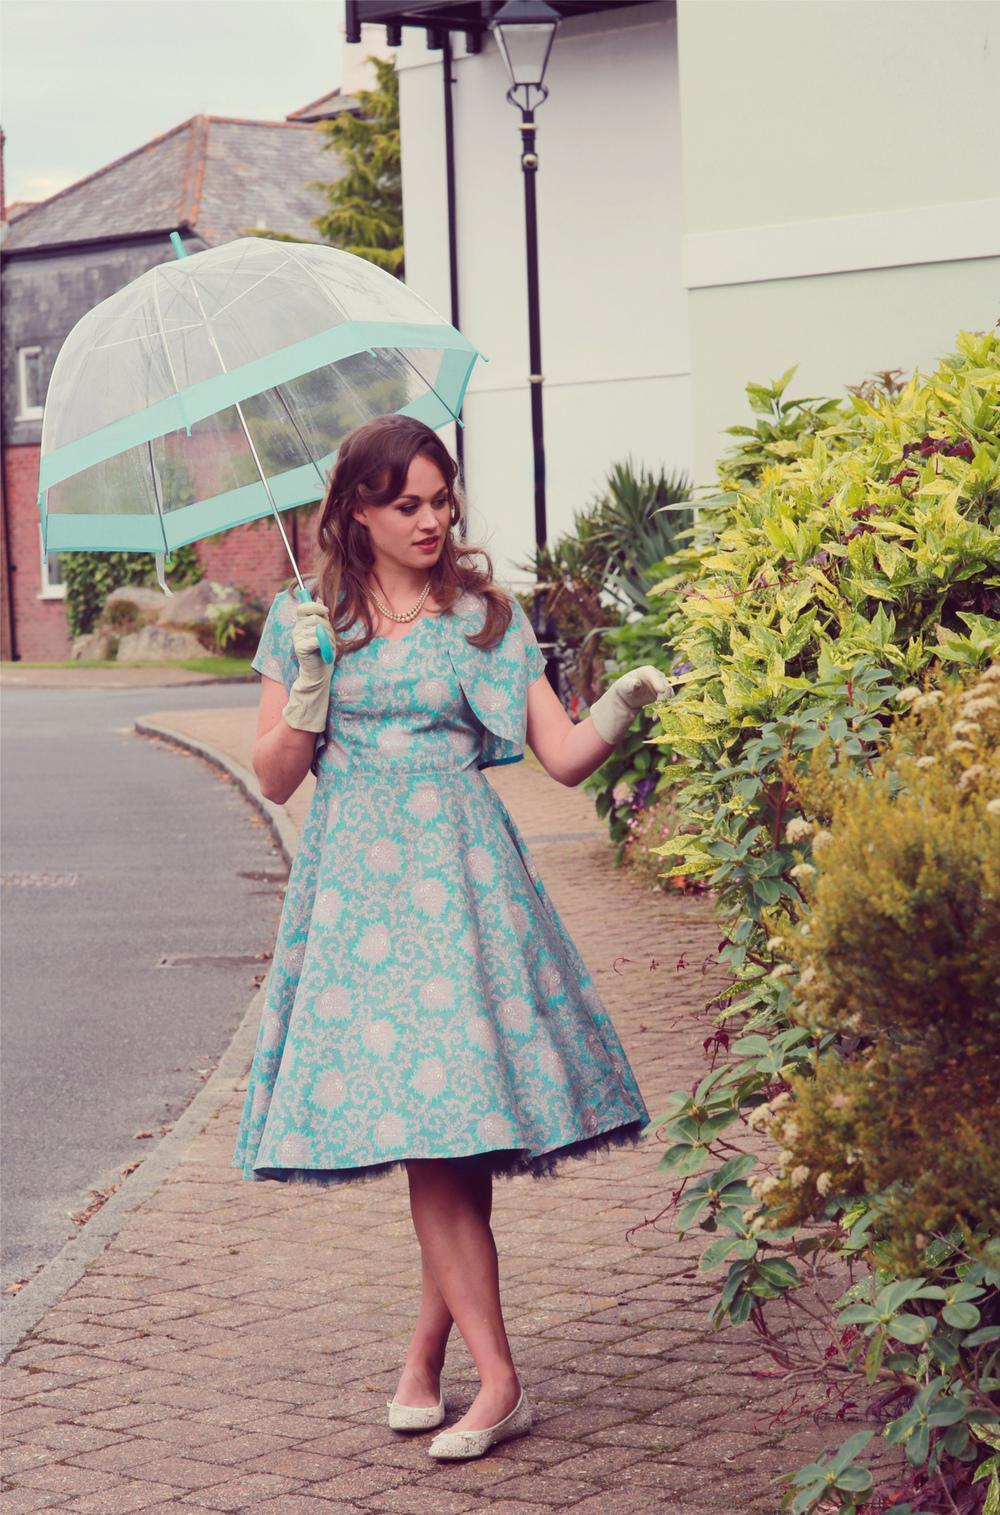 Jo Chatterley - Vintage life Sept 2015